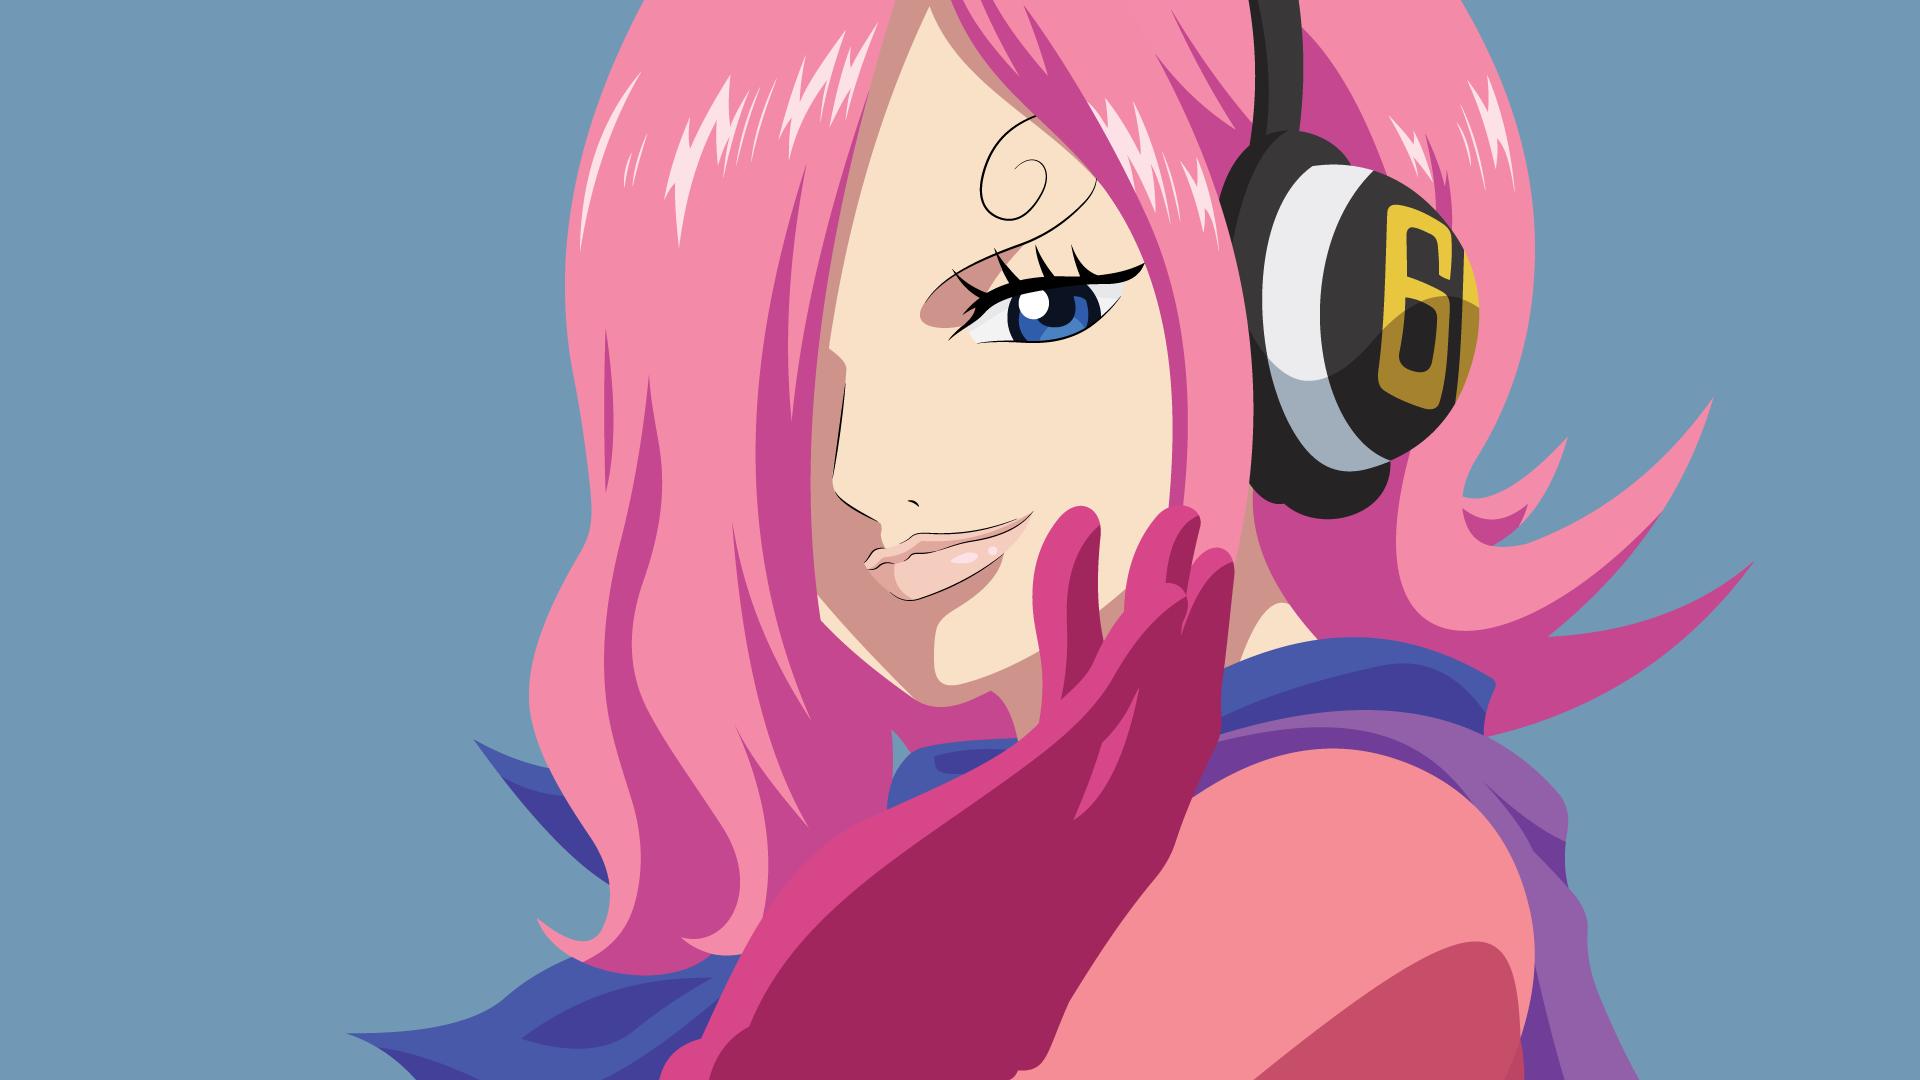 One Piece - Vinsmoke Reiju 1 by YoshinoYoshie on DeviantArt